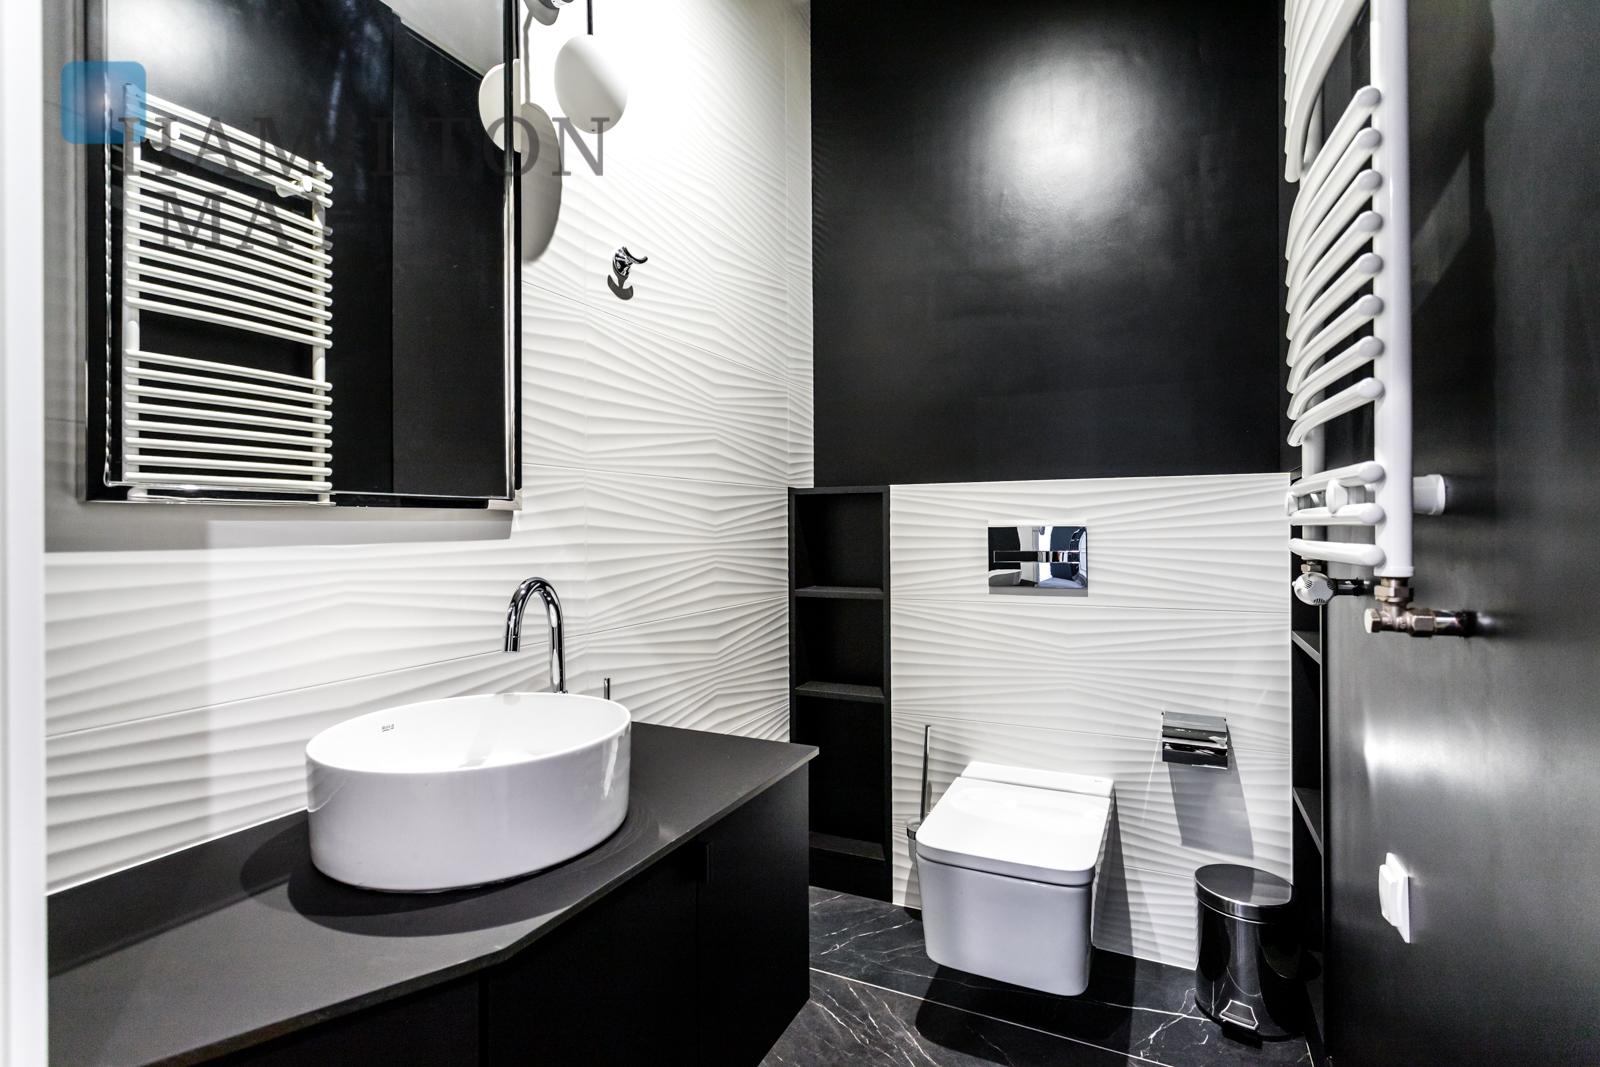 Luxurious one bedroom apartment in Śródmieście Warsaw for rent